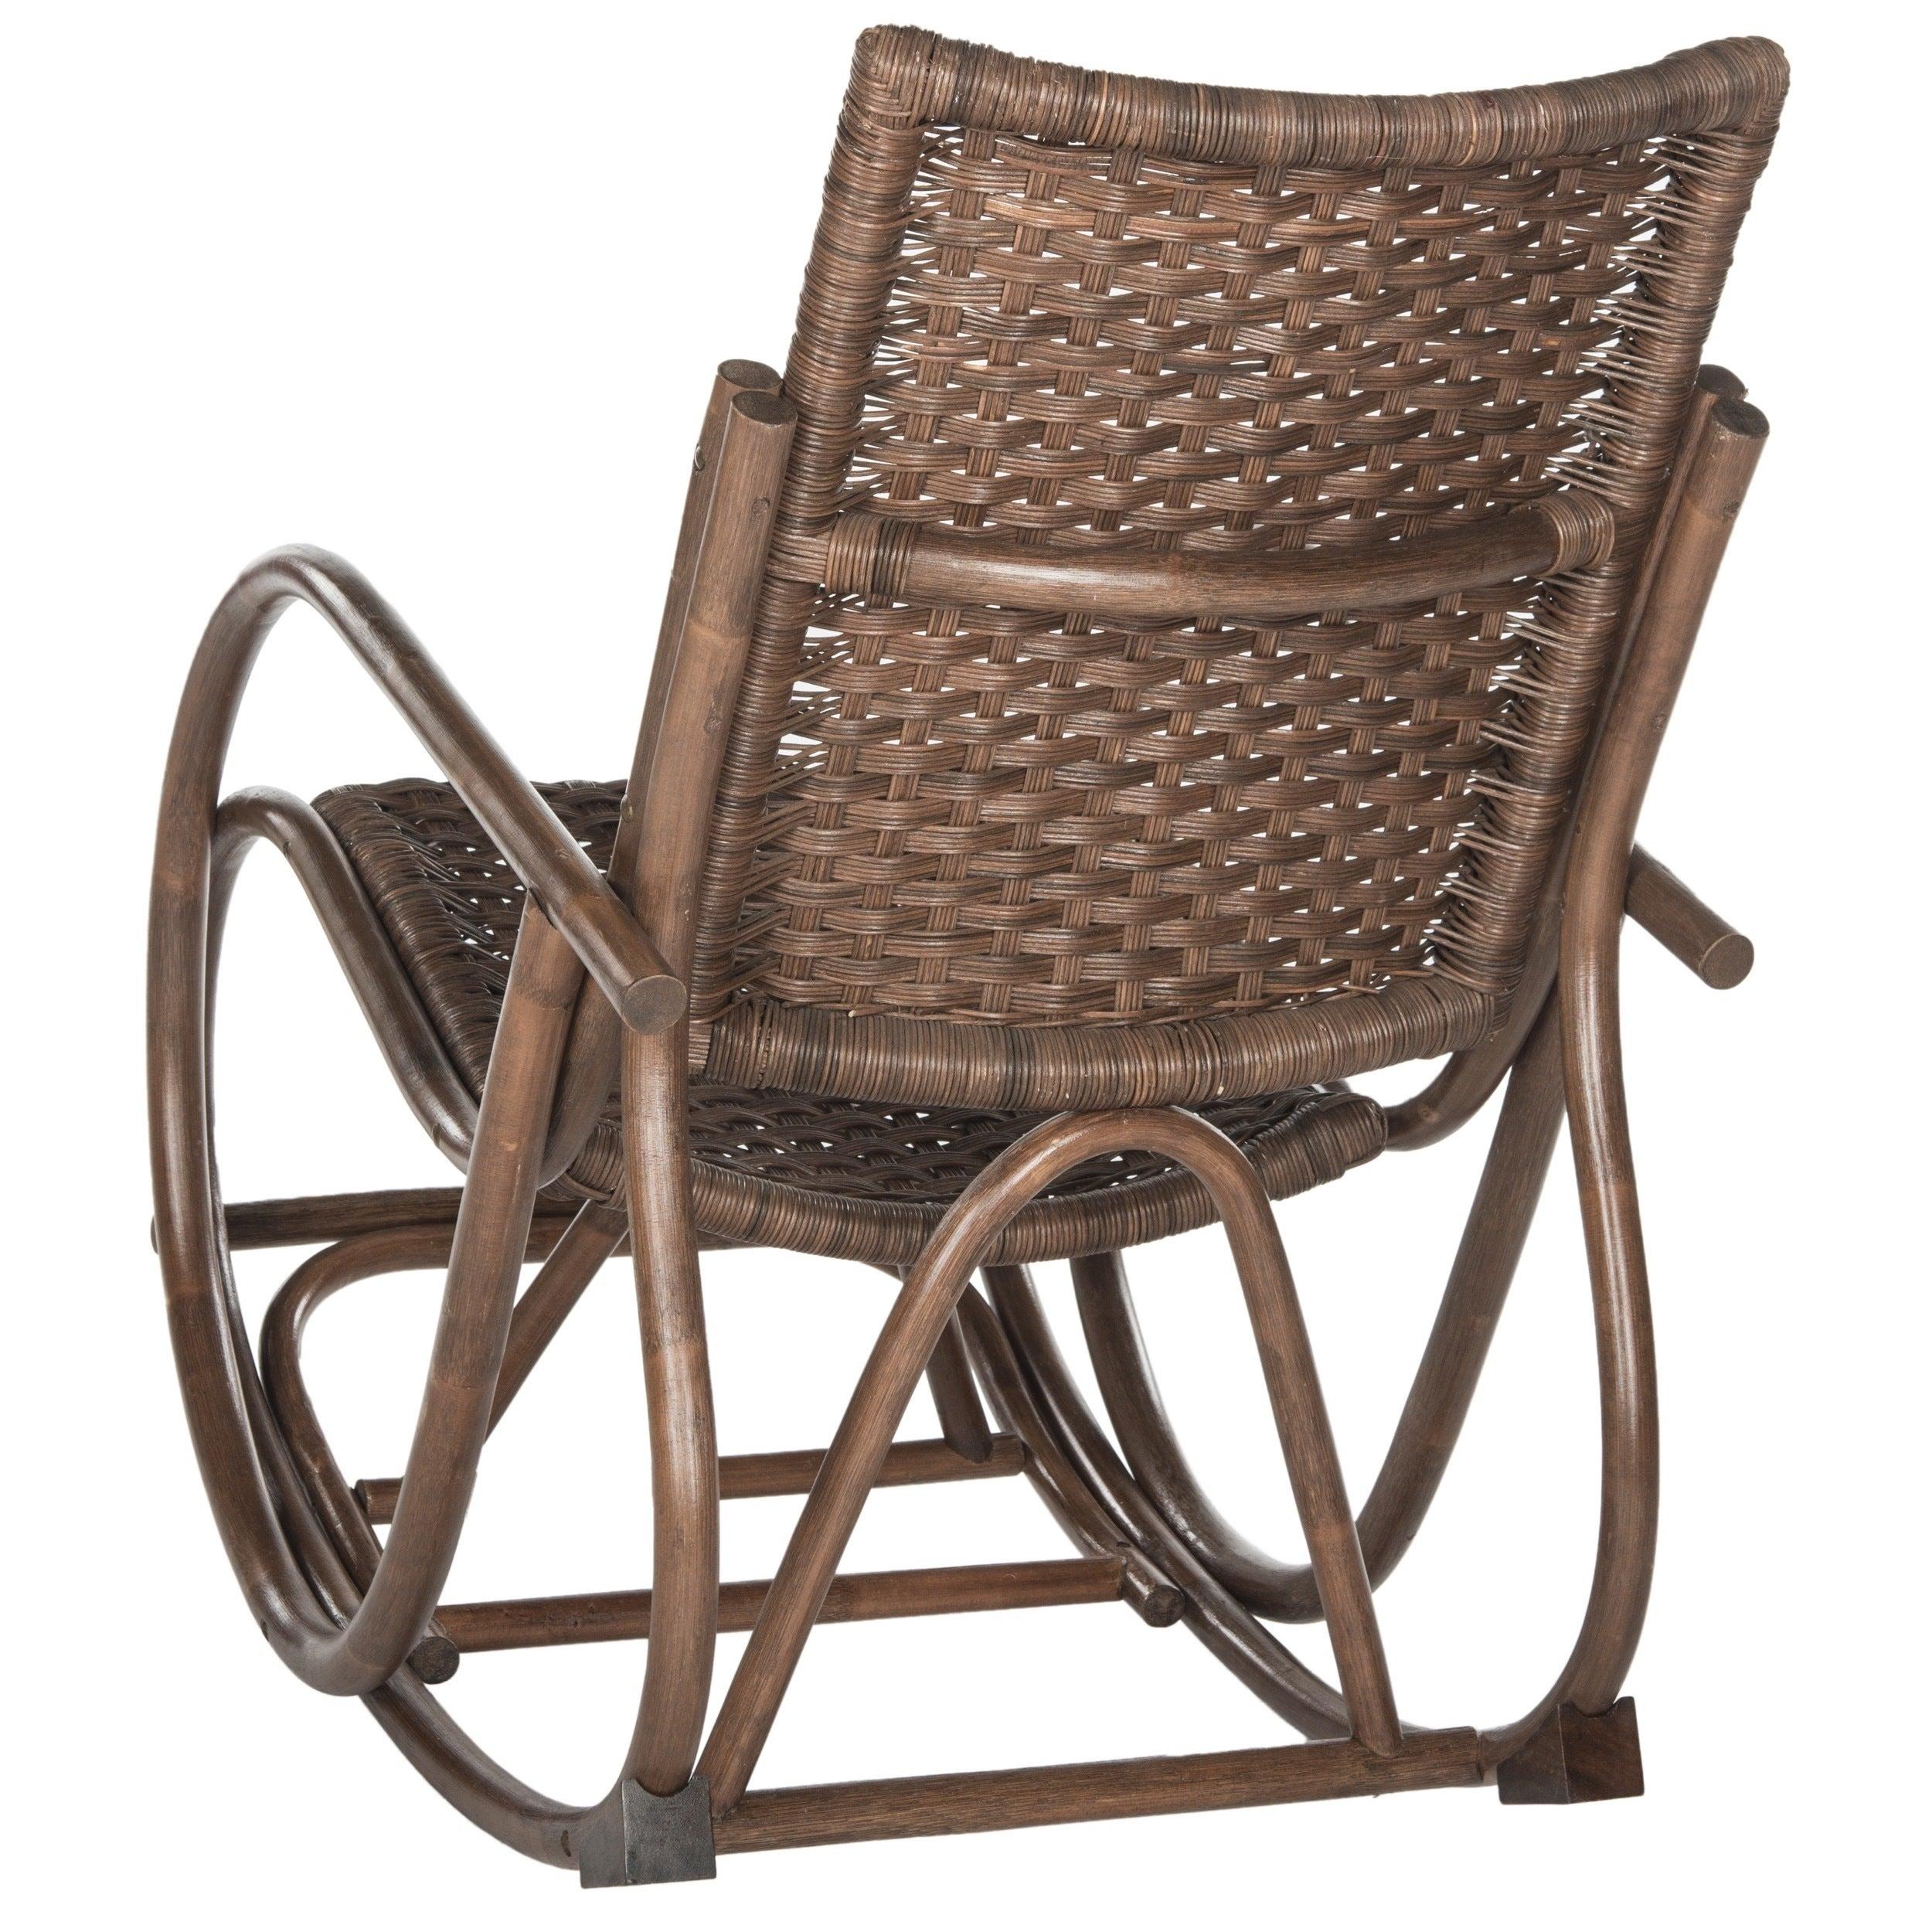 Safavieh Bali Brown Rocking Chair Within Bali Brown Rocking Chairs (View 3 of 20)